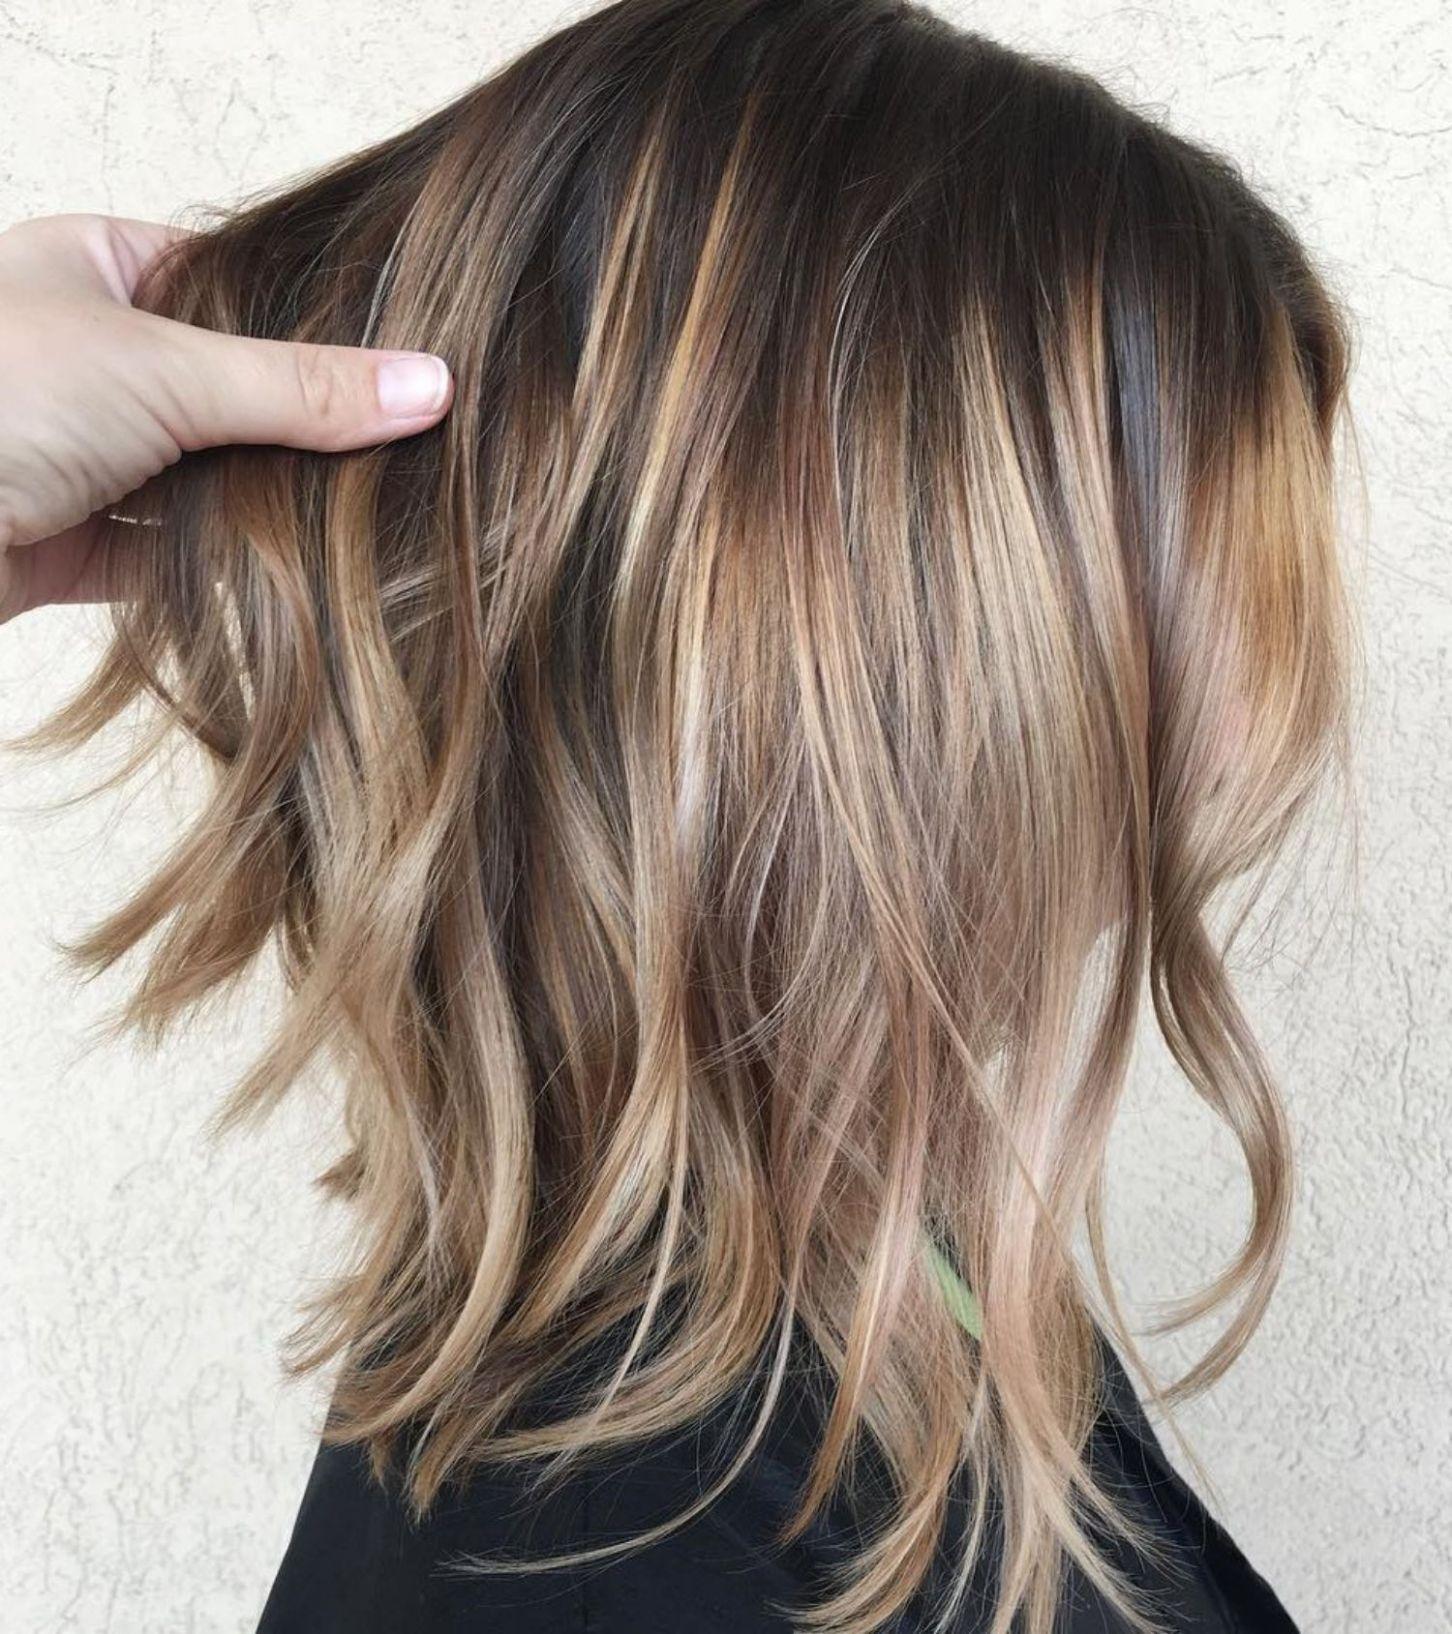 70 Perfect Medium Length Hairstyles For Thin Hair Long Bob Hairstyles Thin Bob Hairstyles For Fine Hair Medium Length Hair Styles